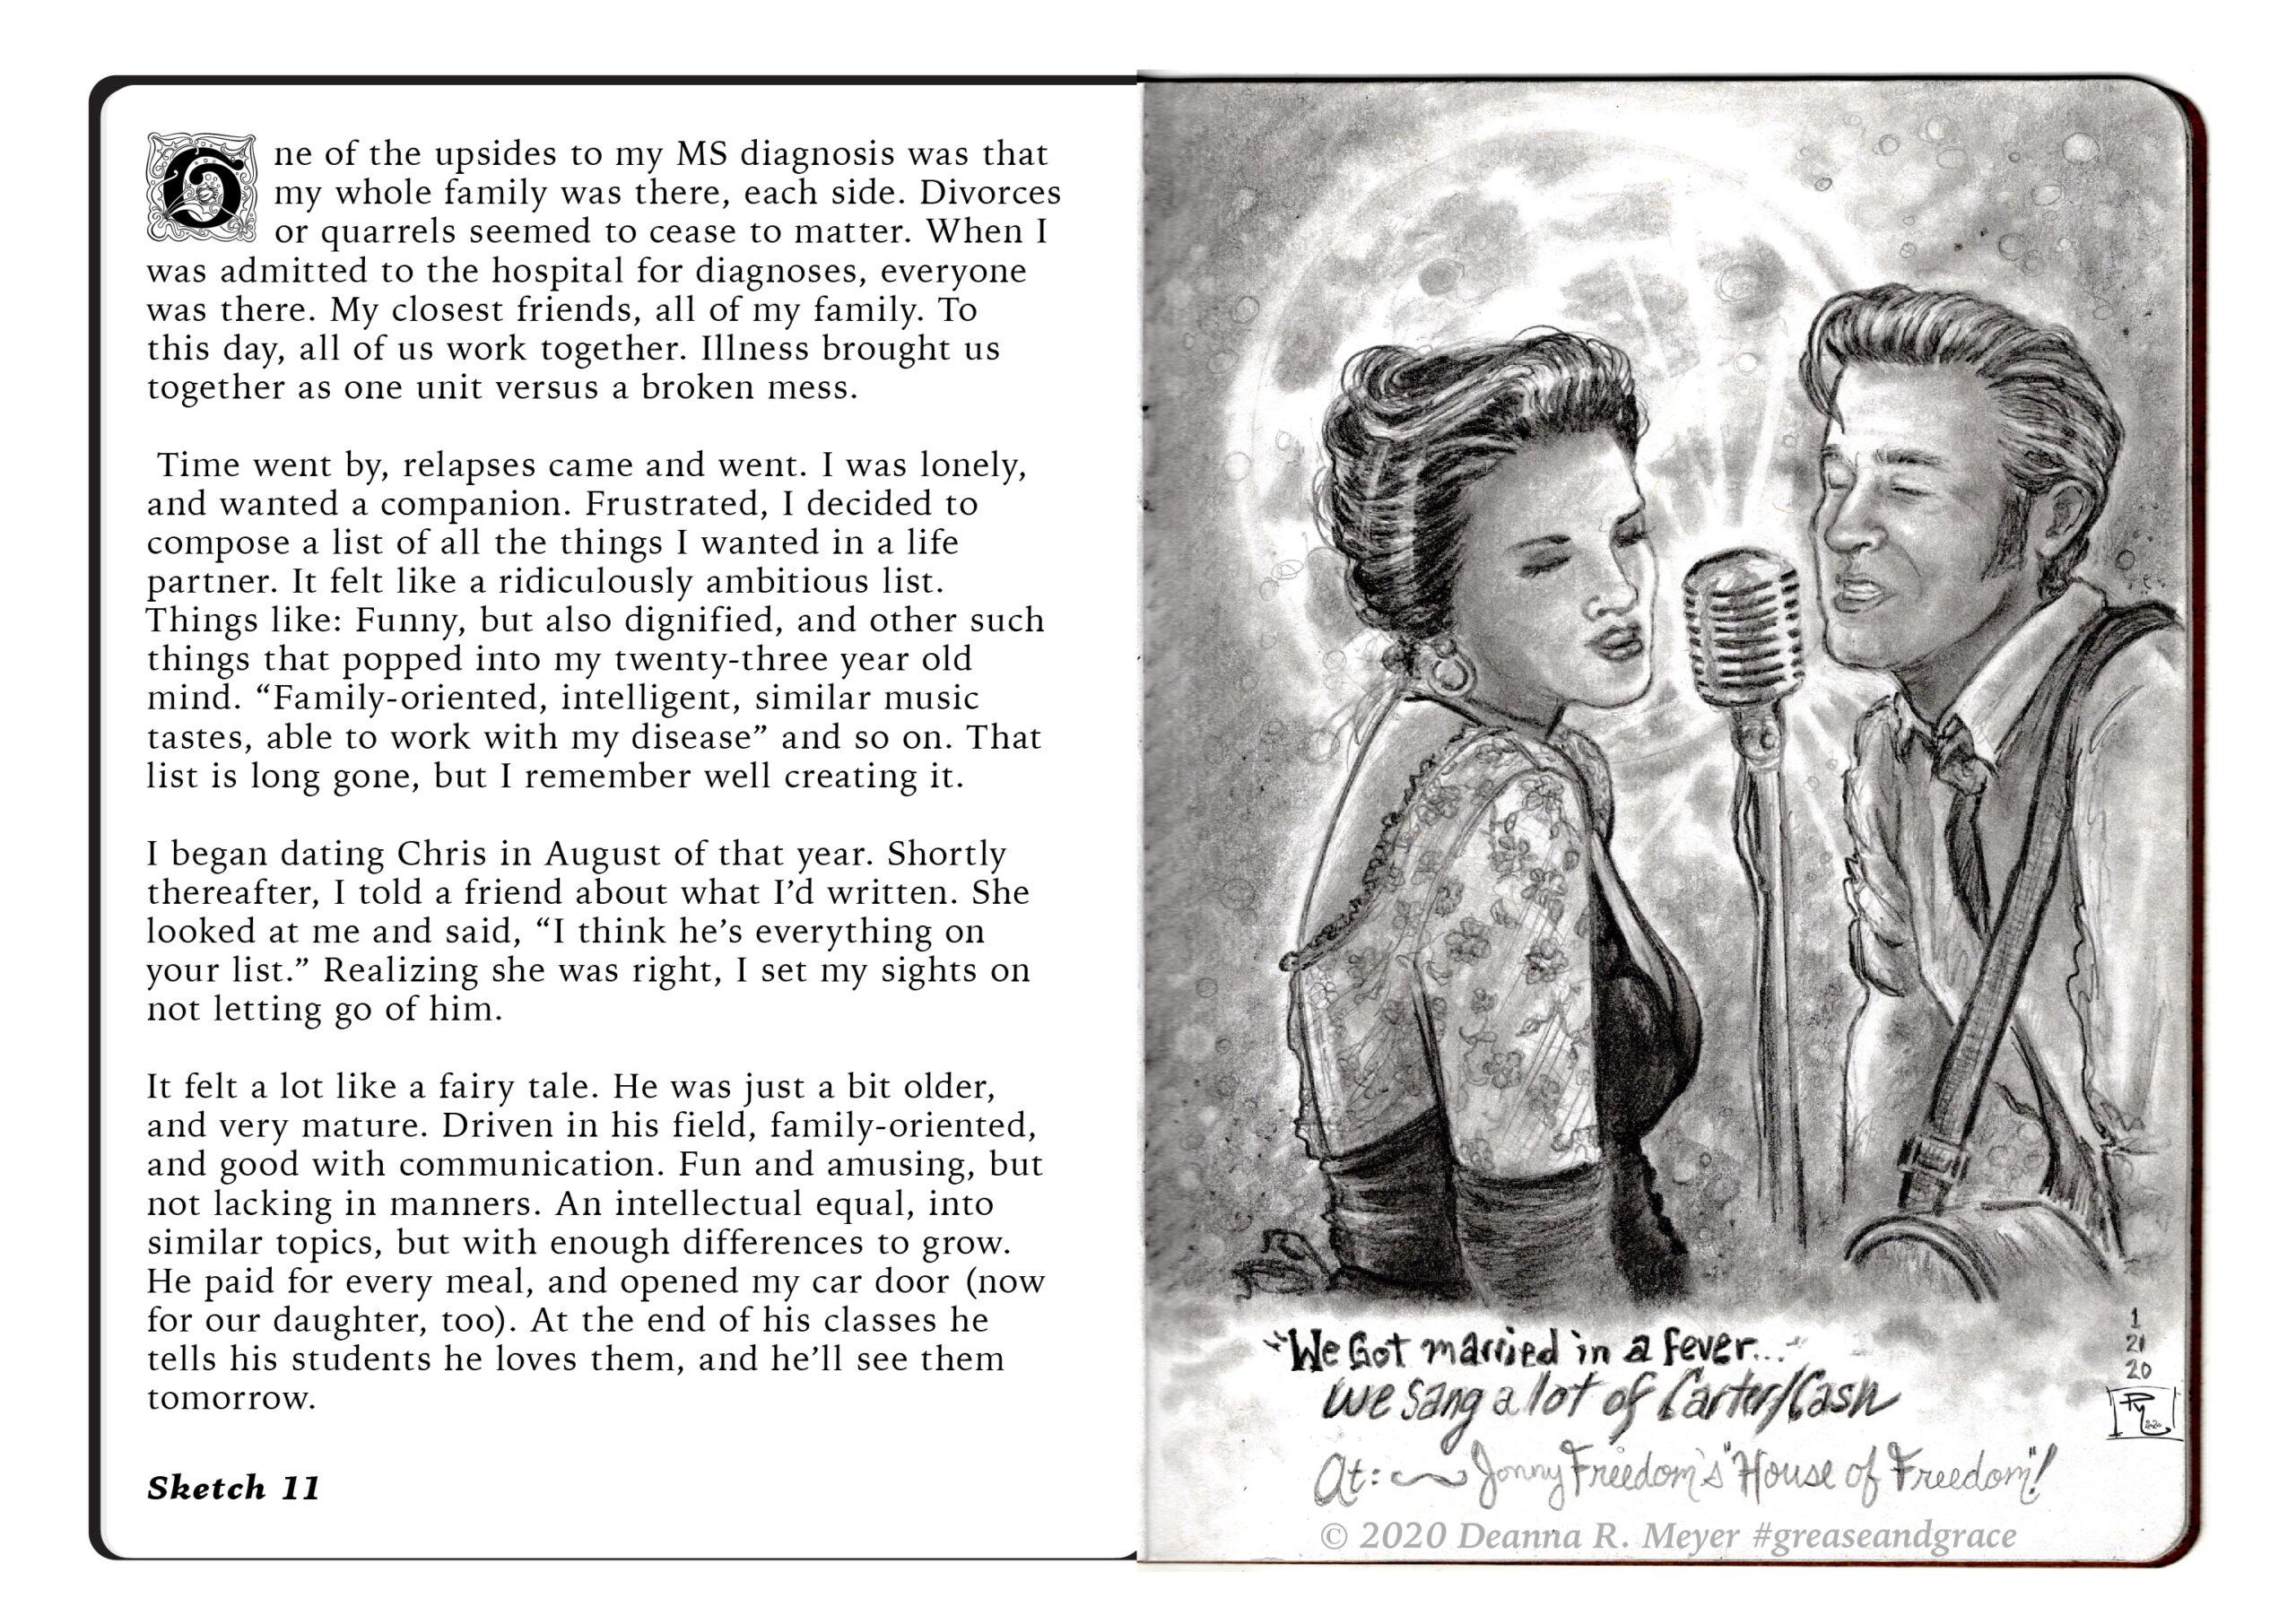 """Believe"" by Deanna R. Meyer Brooklyn Art Library Call No. 373.26-2"